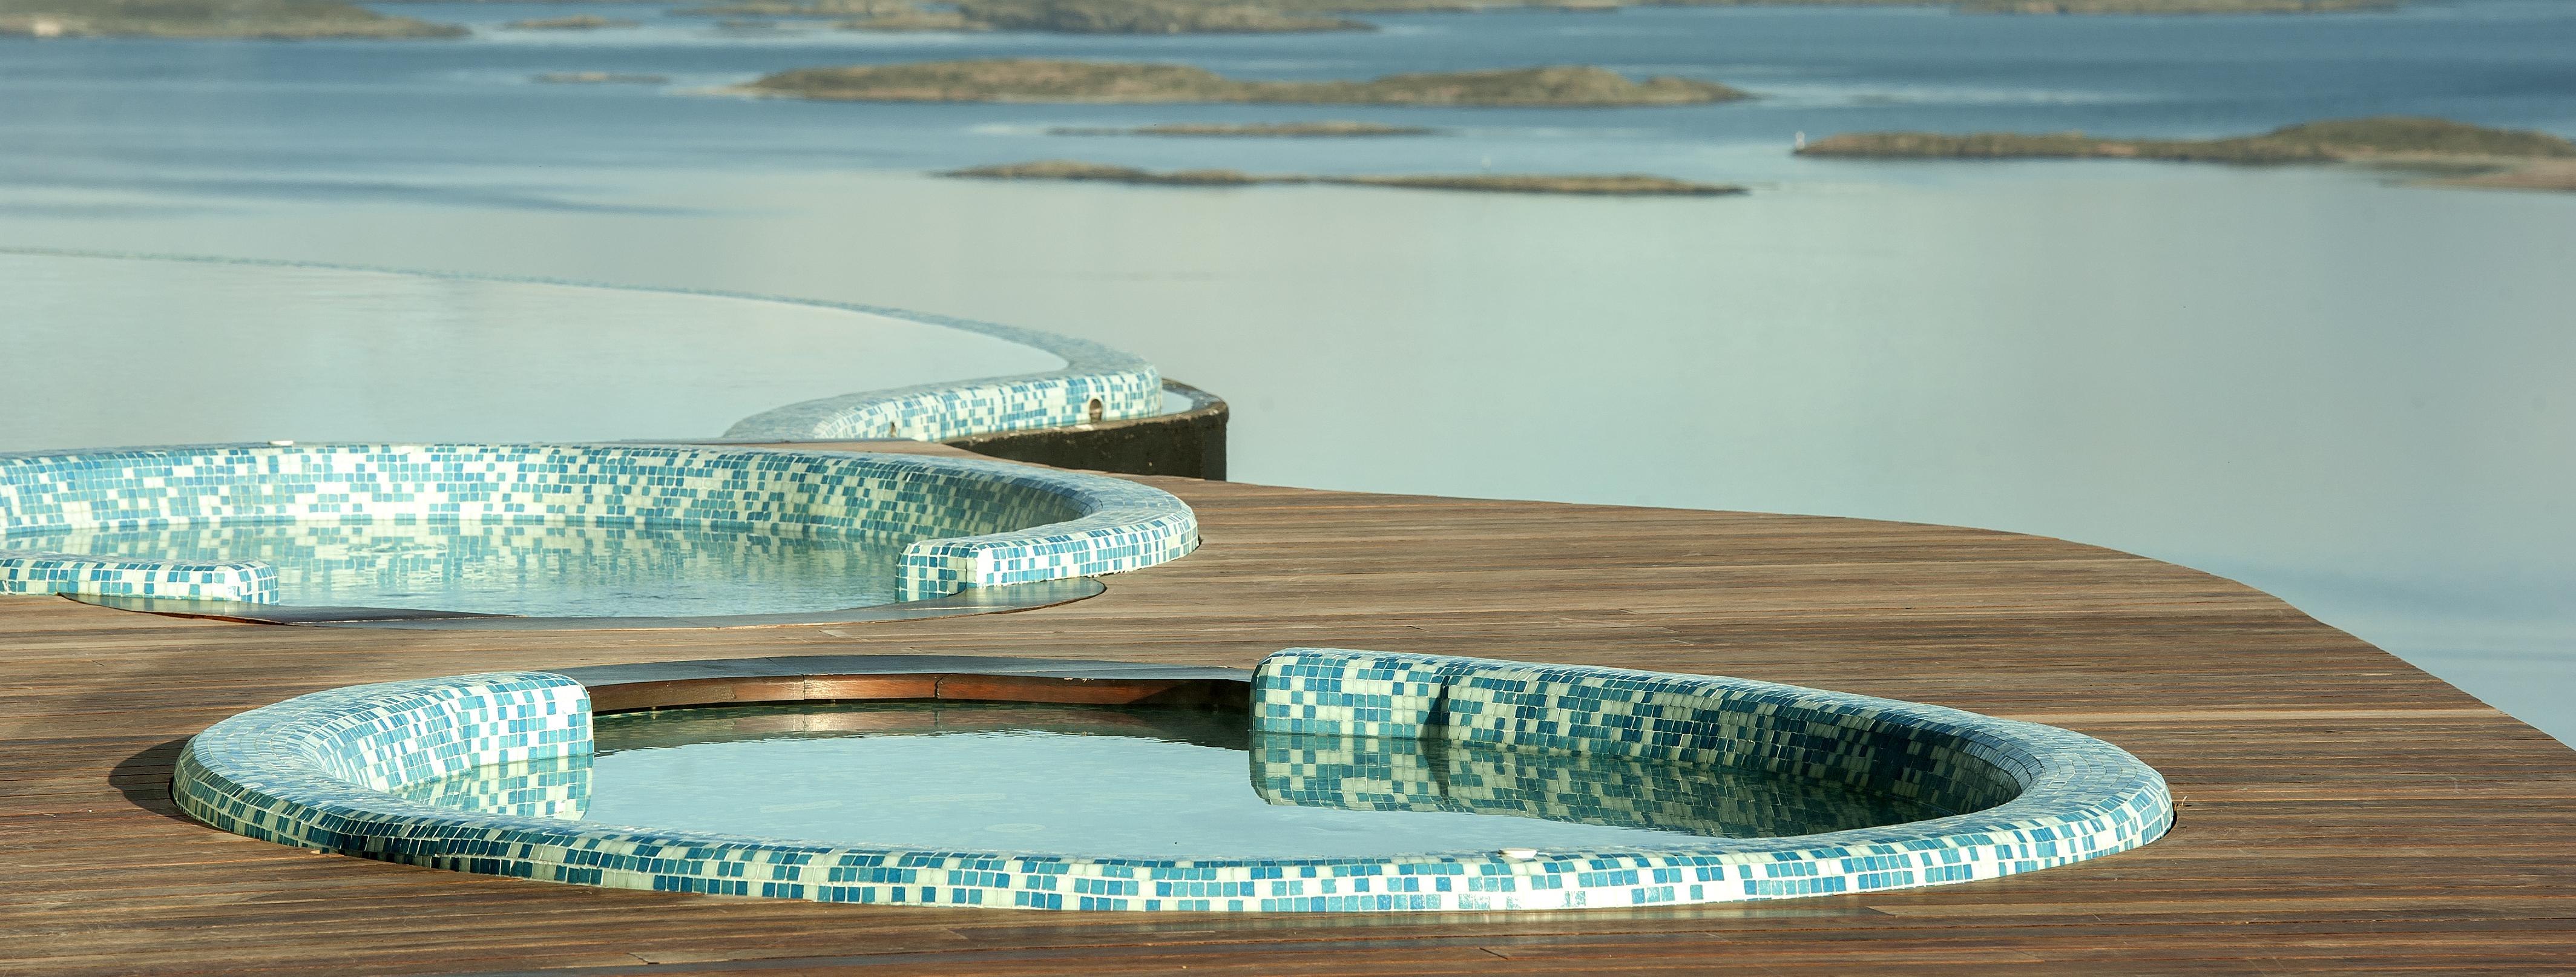 arakur-ushuaia-hotel-outdoor-hot-tubs